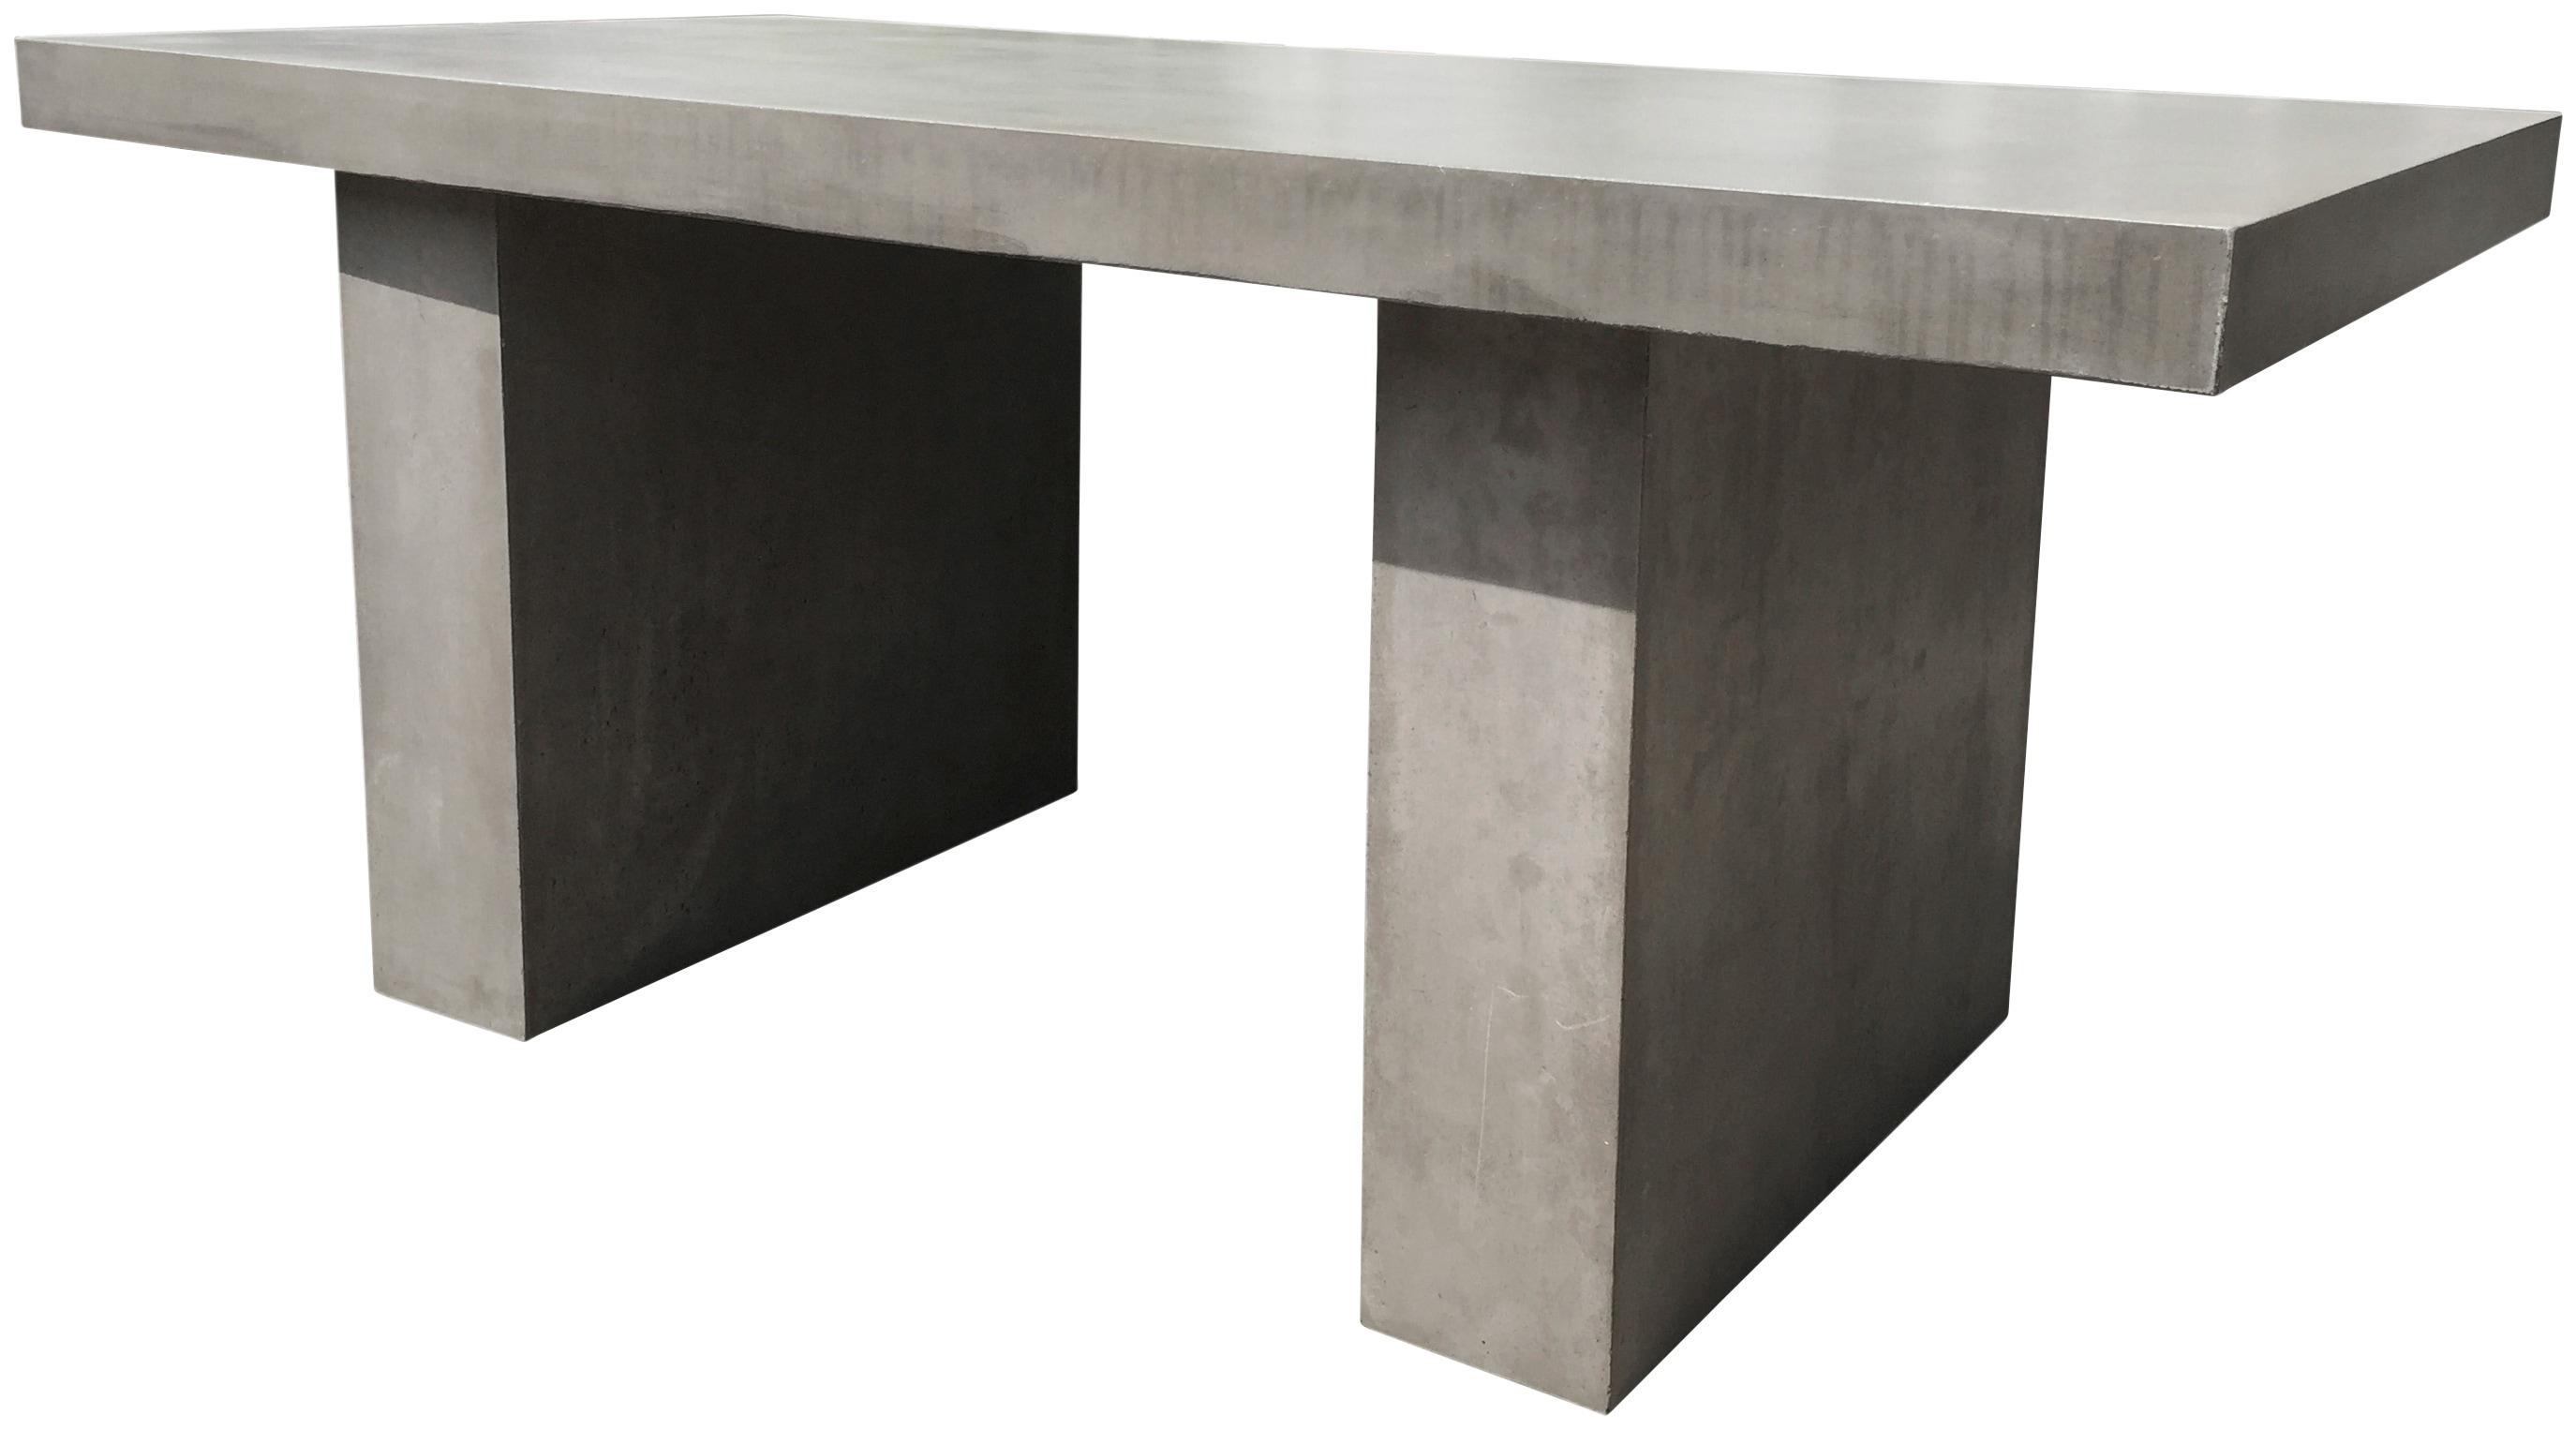 Image of ANDIAMO Gartentisch »Gravis«, 3-tlg., Beton, Masse (B/H/T) 90x76x180 cm